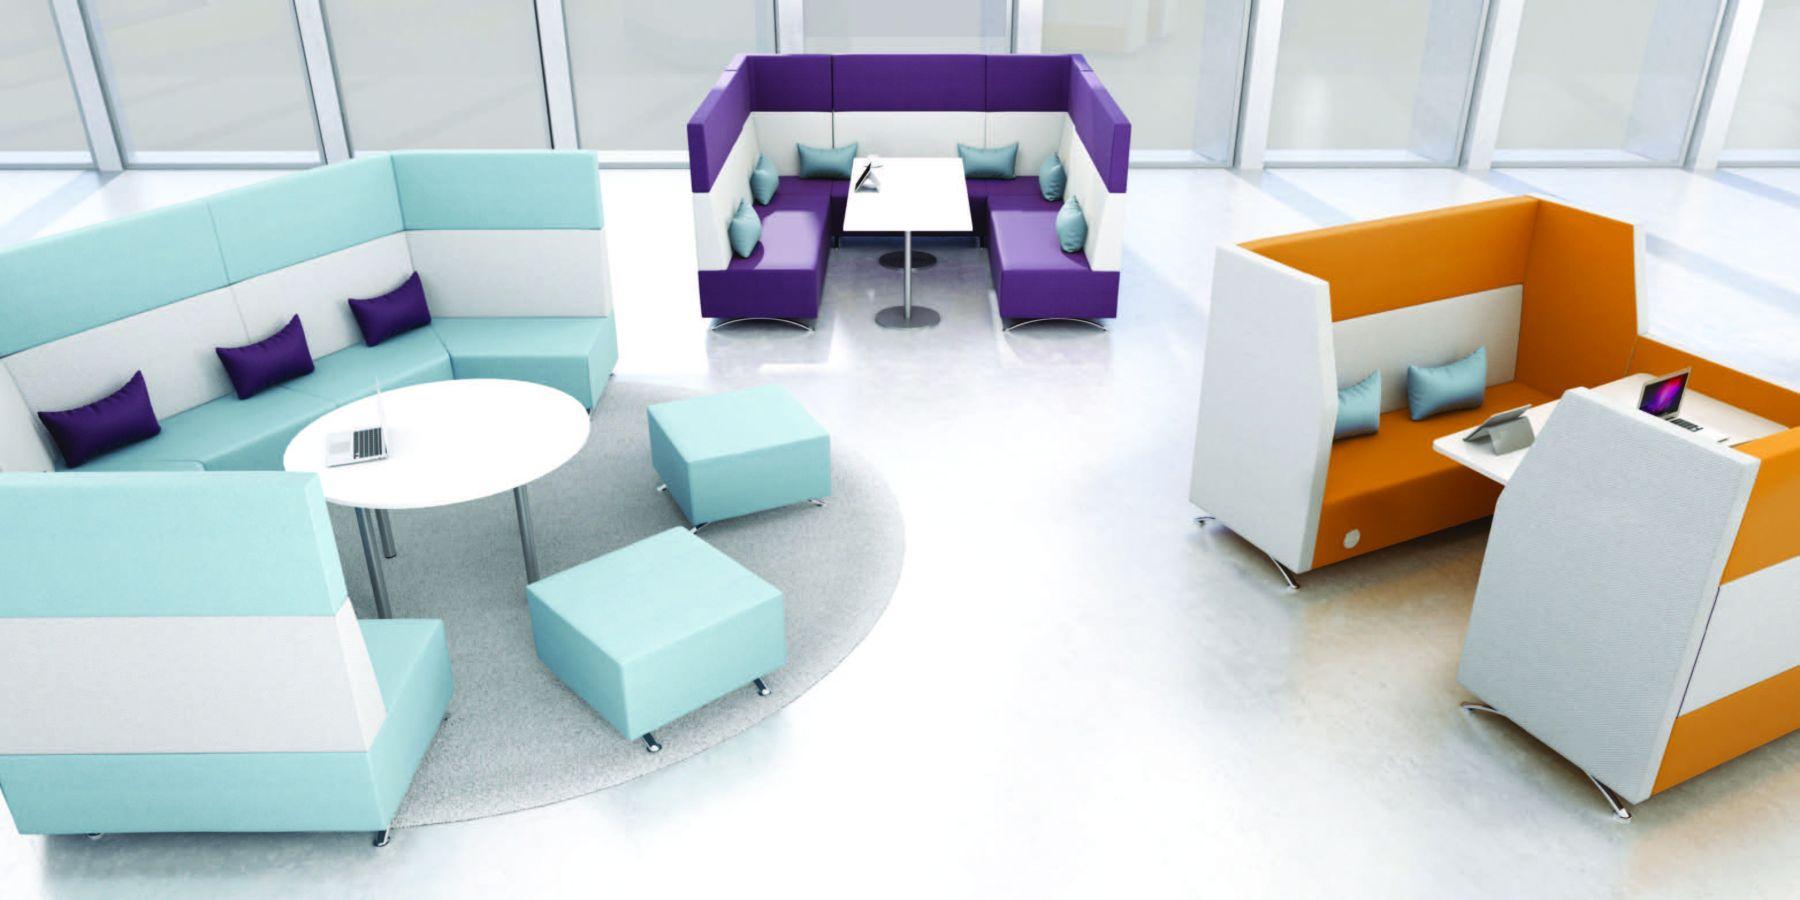 purple, orange, teal seating area healthcare sector